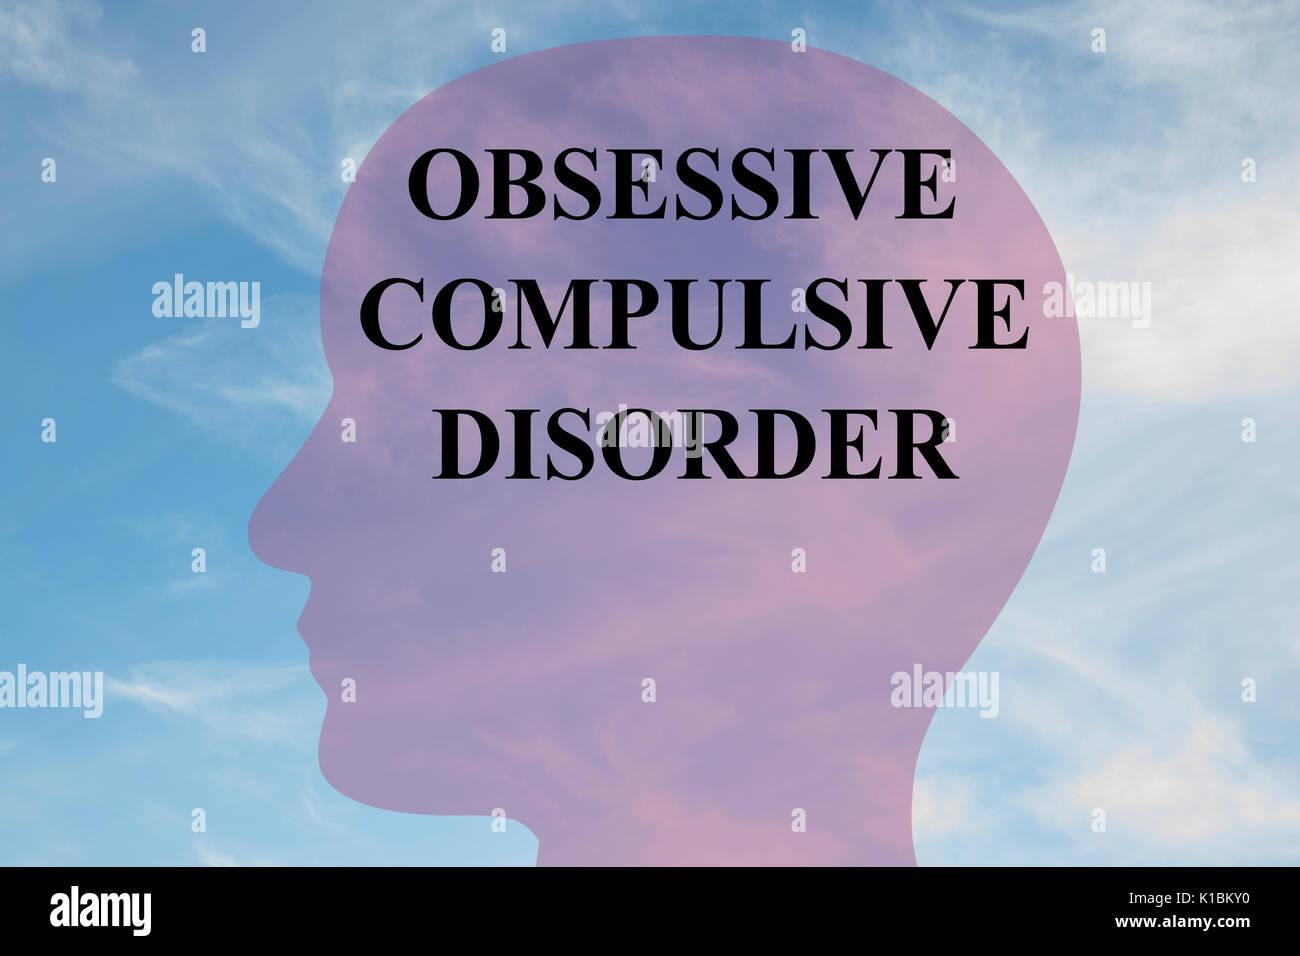 Obsessive Compulsive Stock Photos Amp Obsessive Compulsive